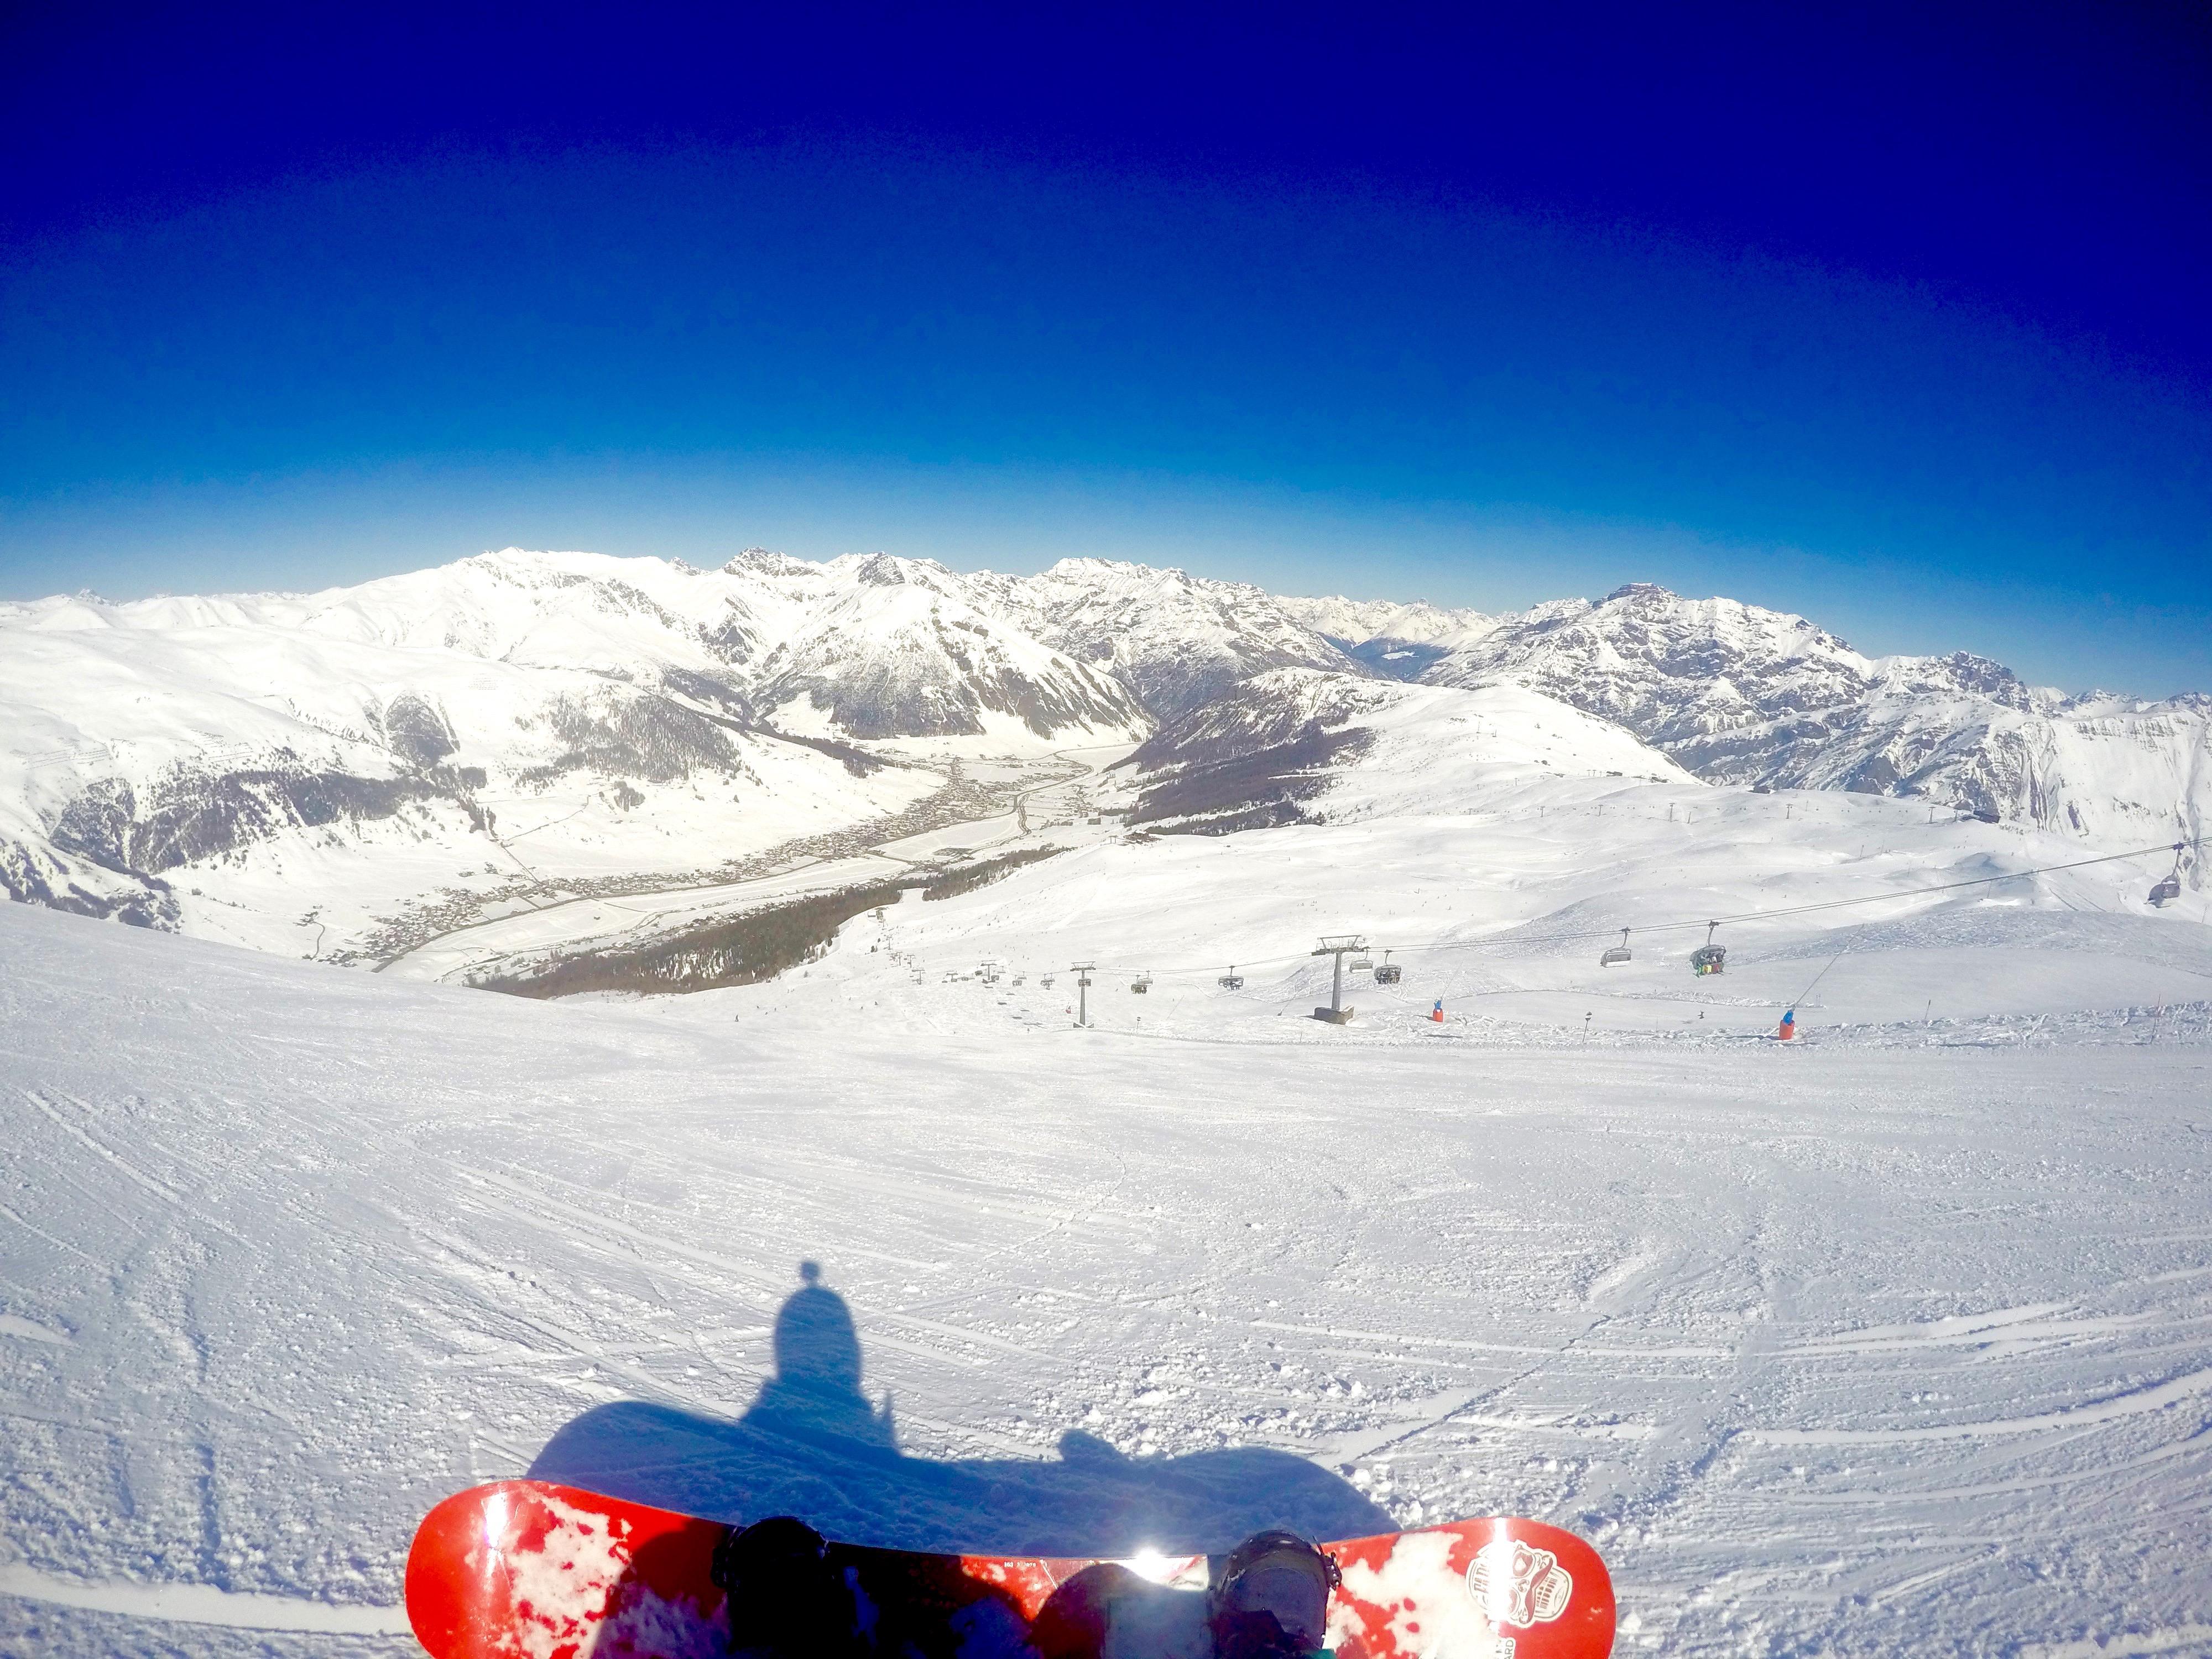 Snowboard in discesa dal Mottolino